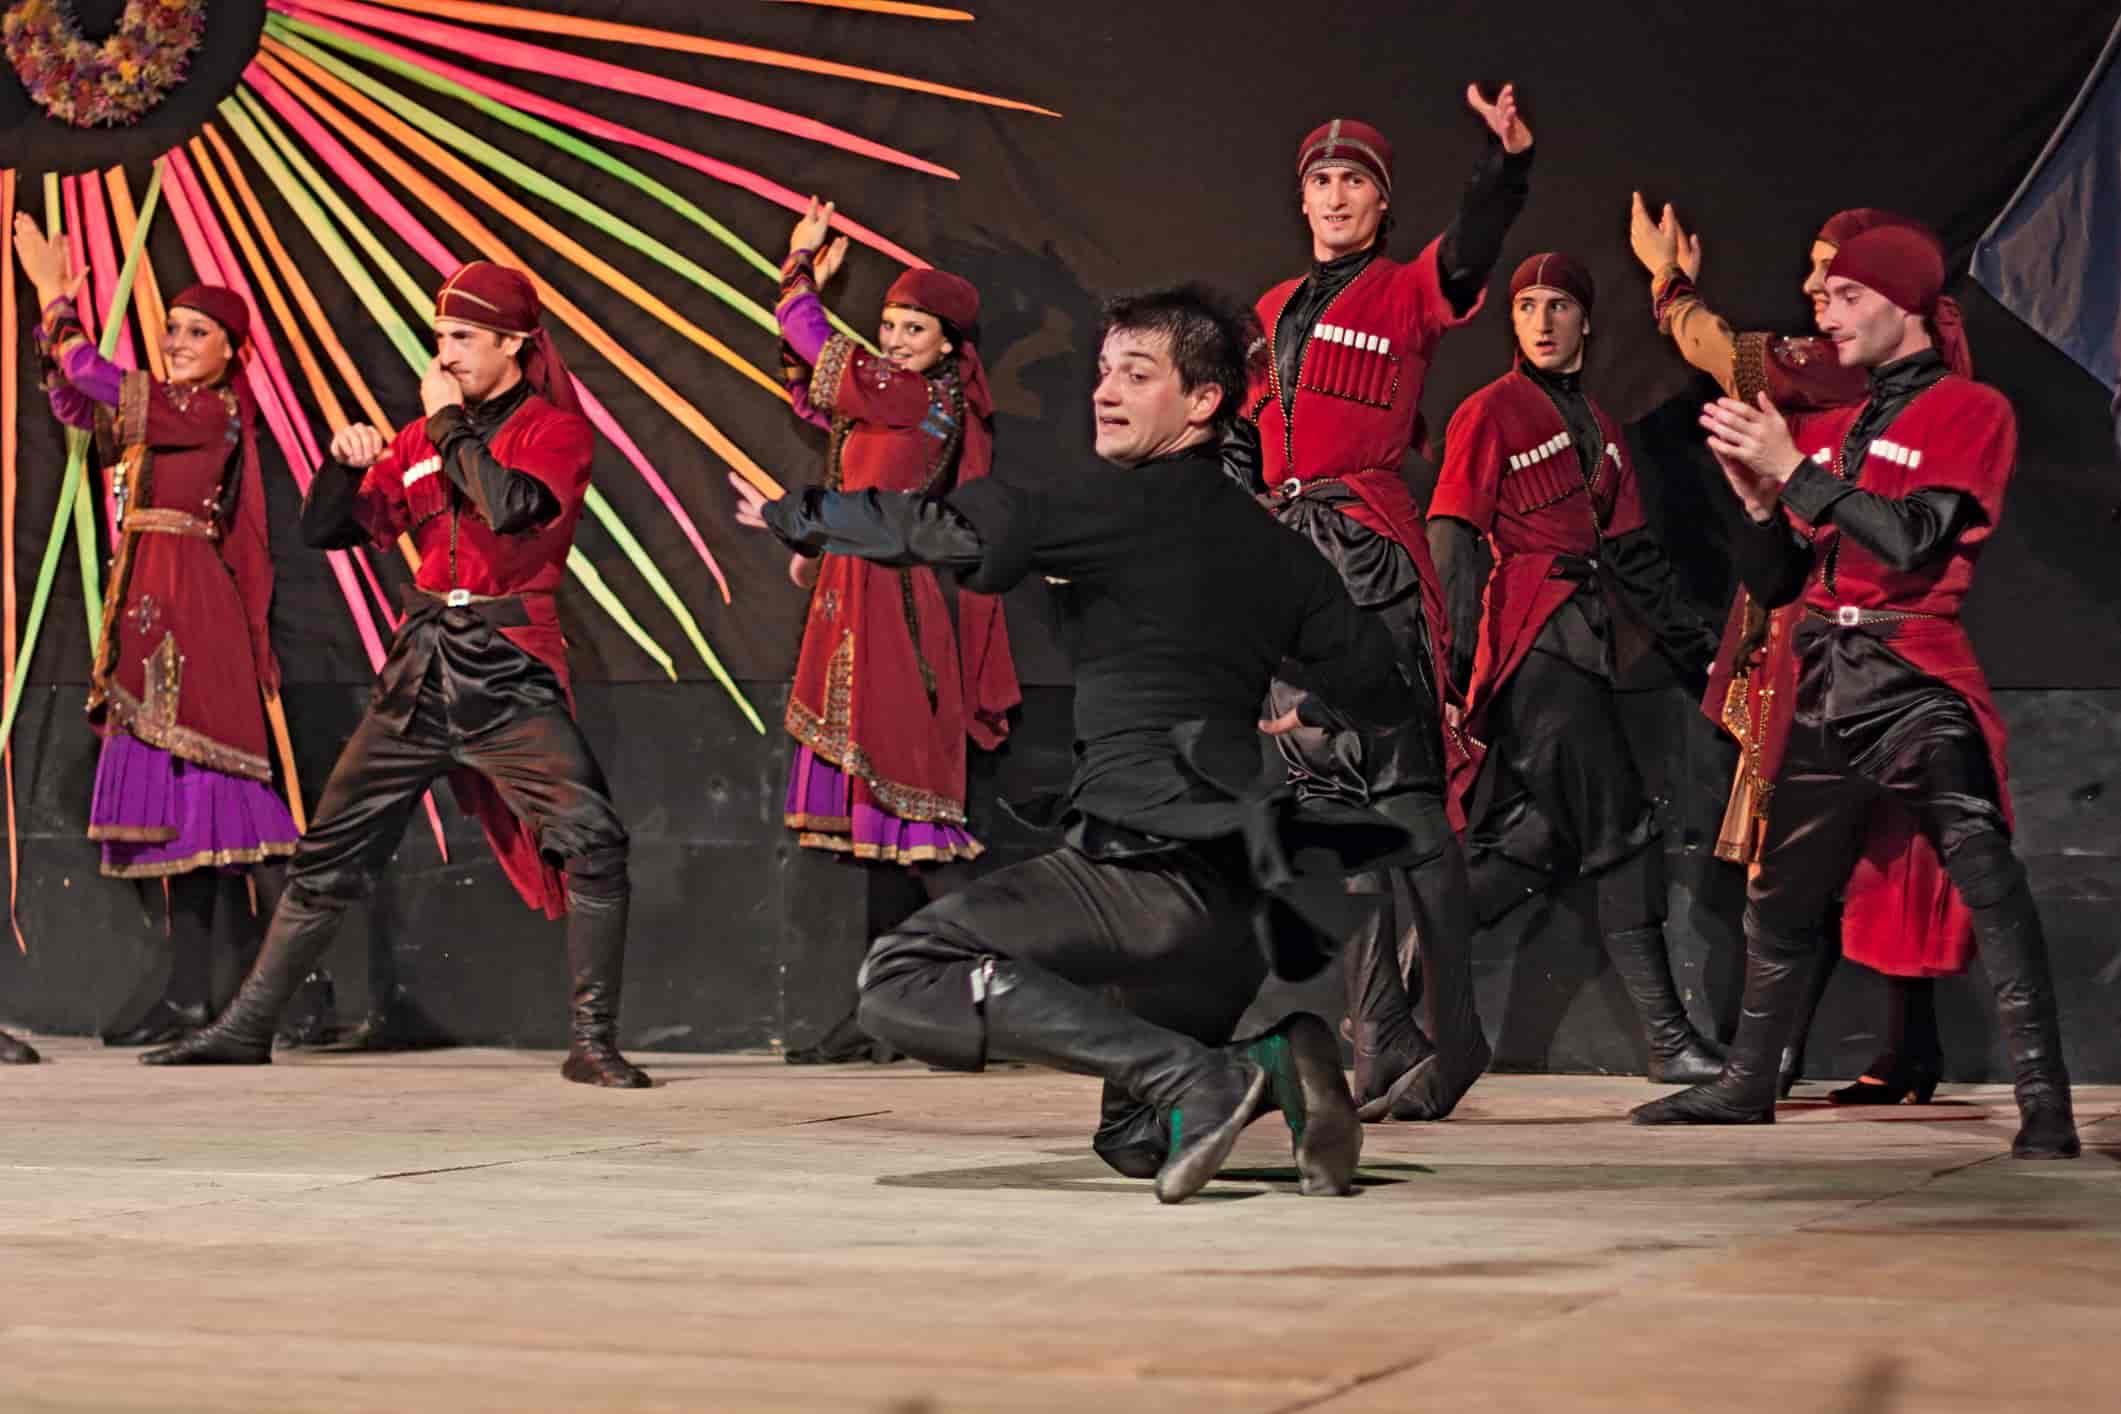 Песни и танцы Грузии, традиции Грузии, Хоруми